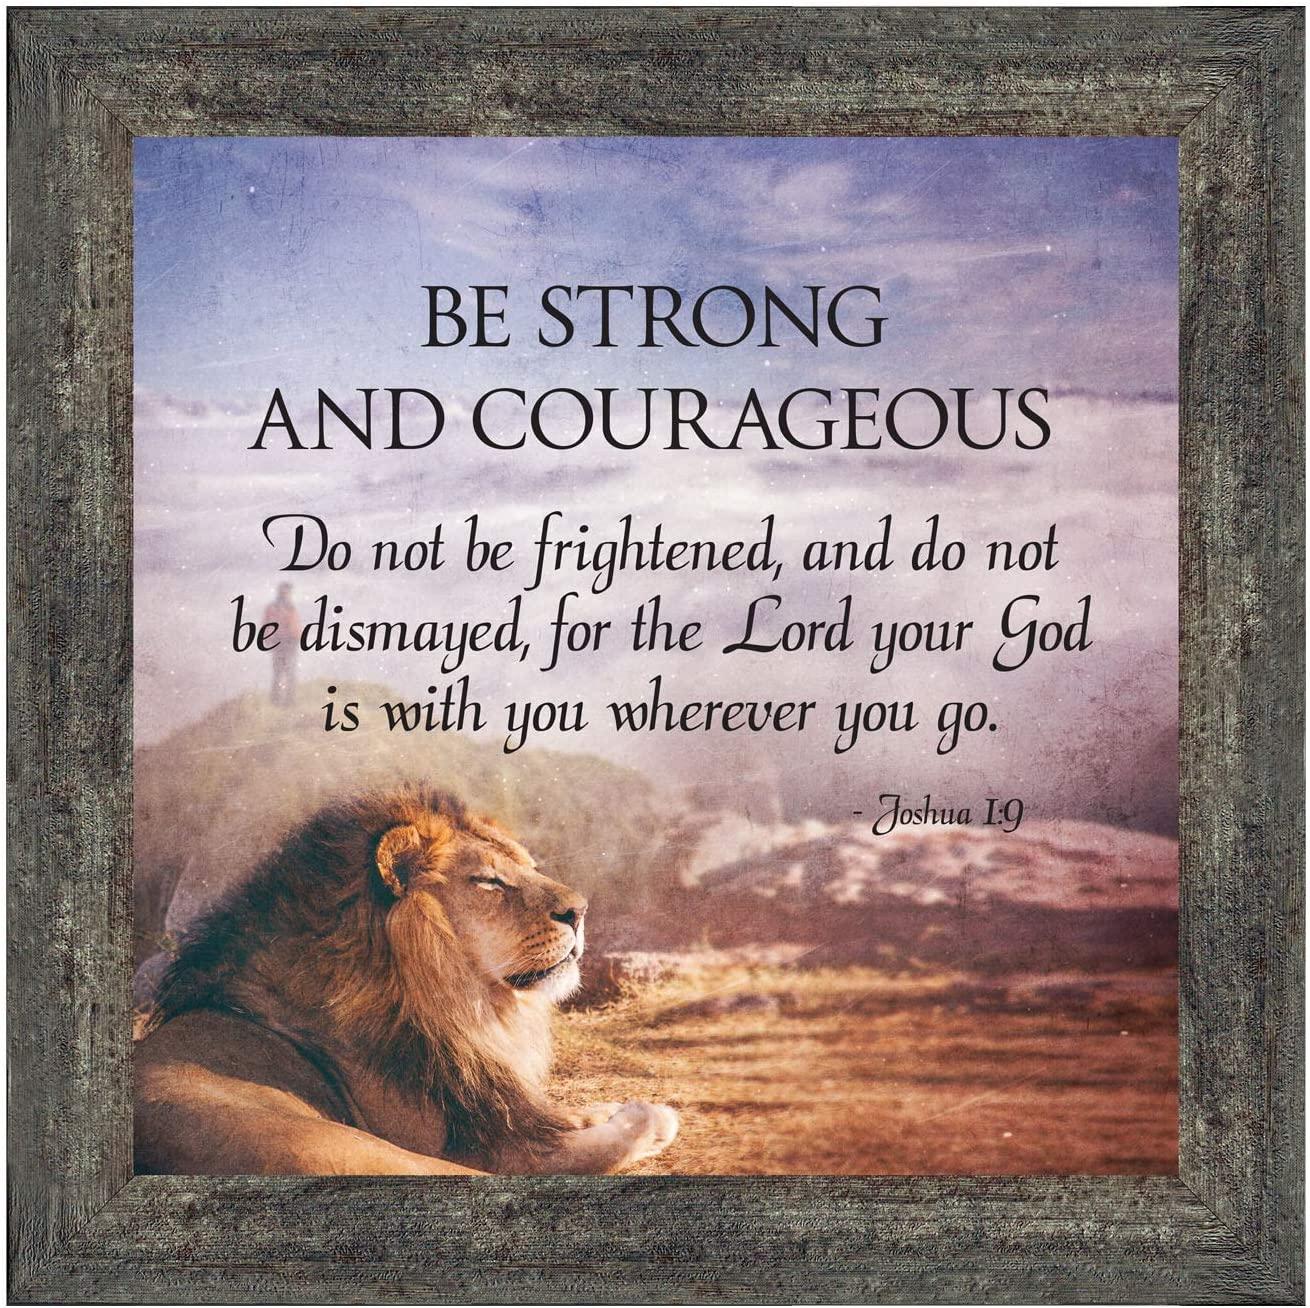 Crossroads Home Décor Be Strong and Courageous, Joshua 1:9, Bible Verse Wall Decor, 8712BW